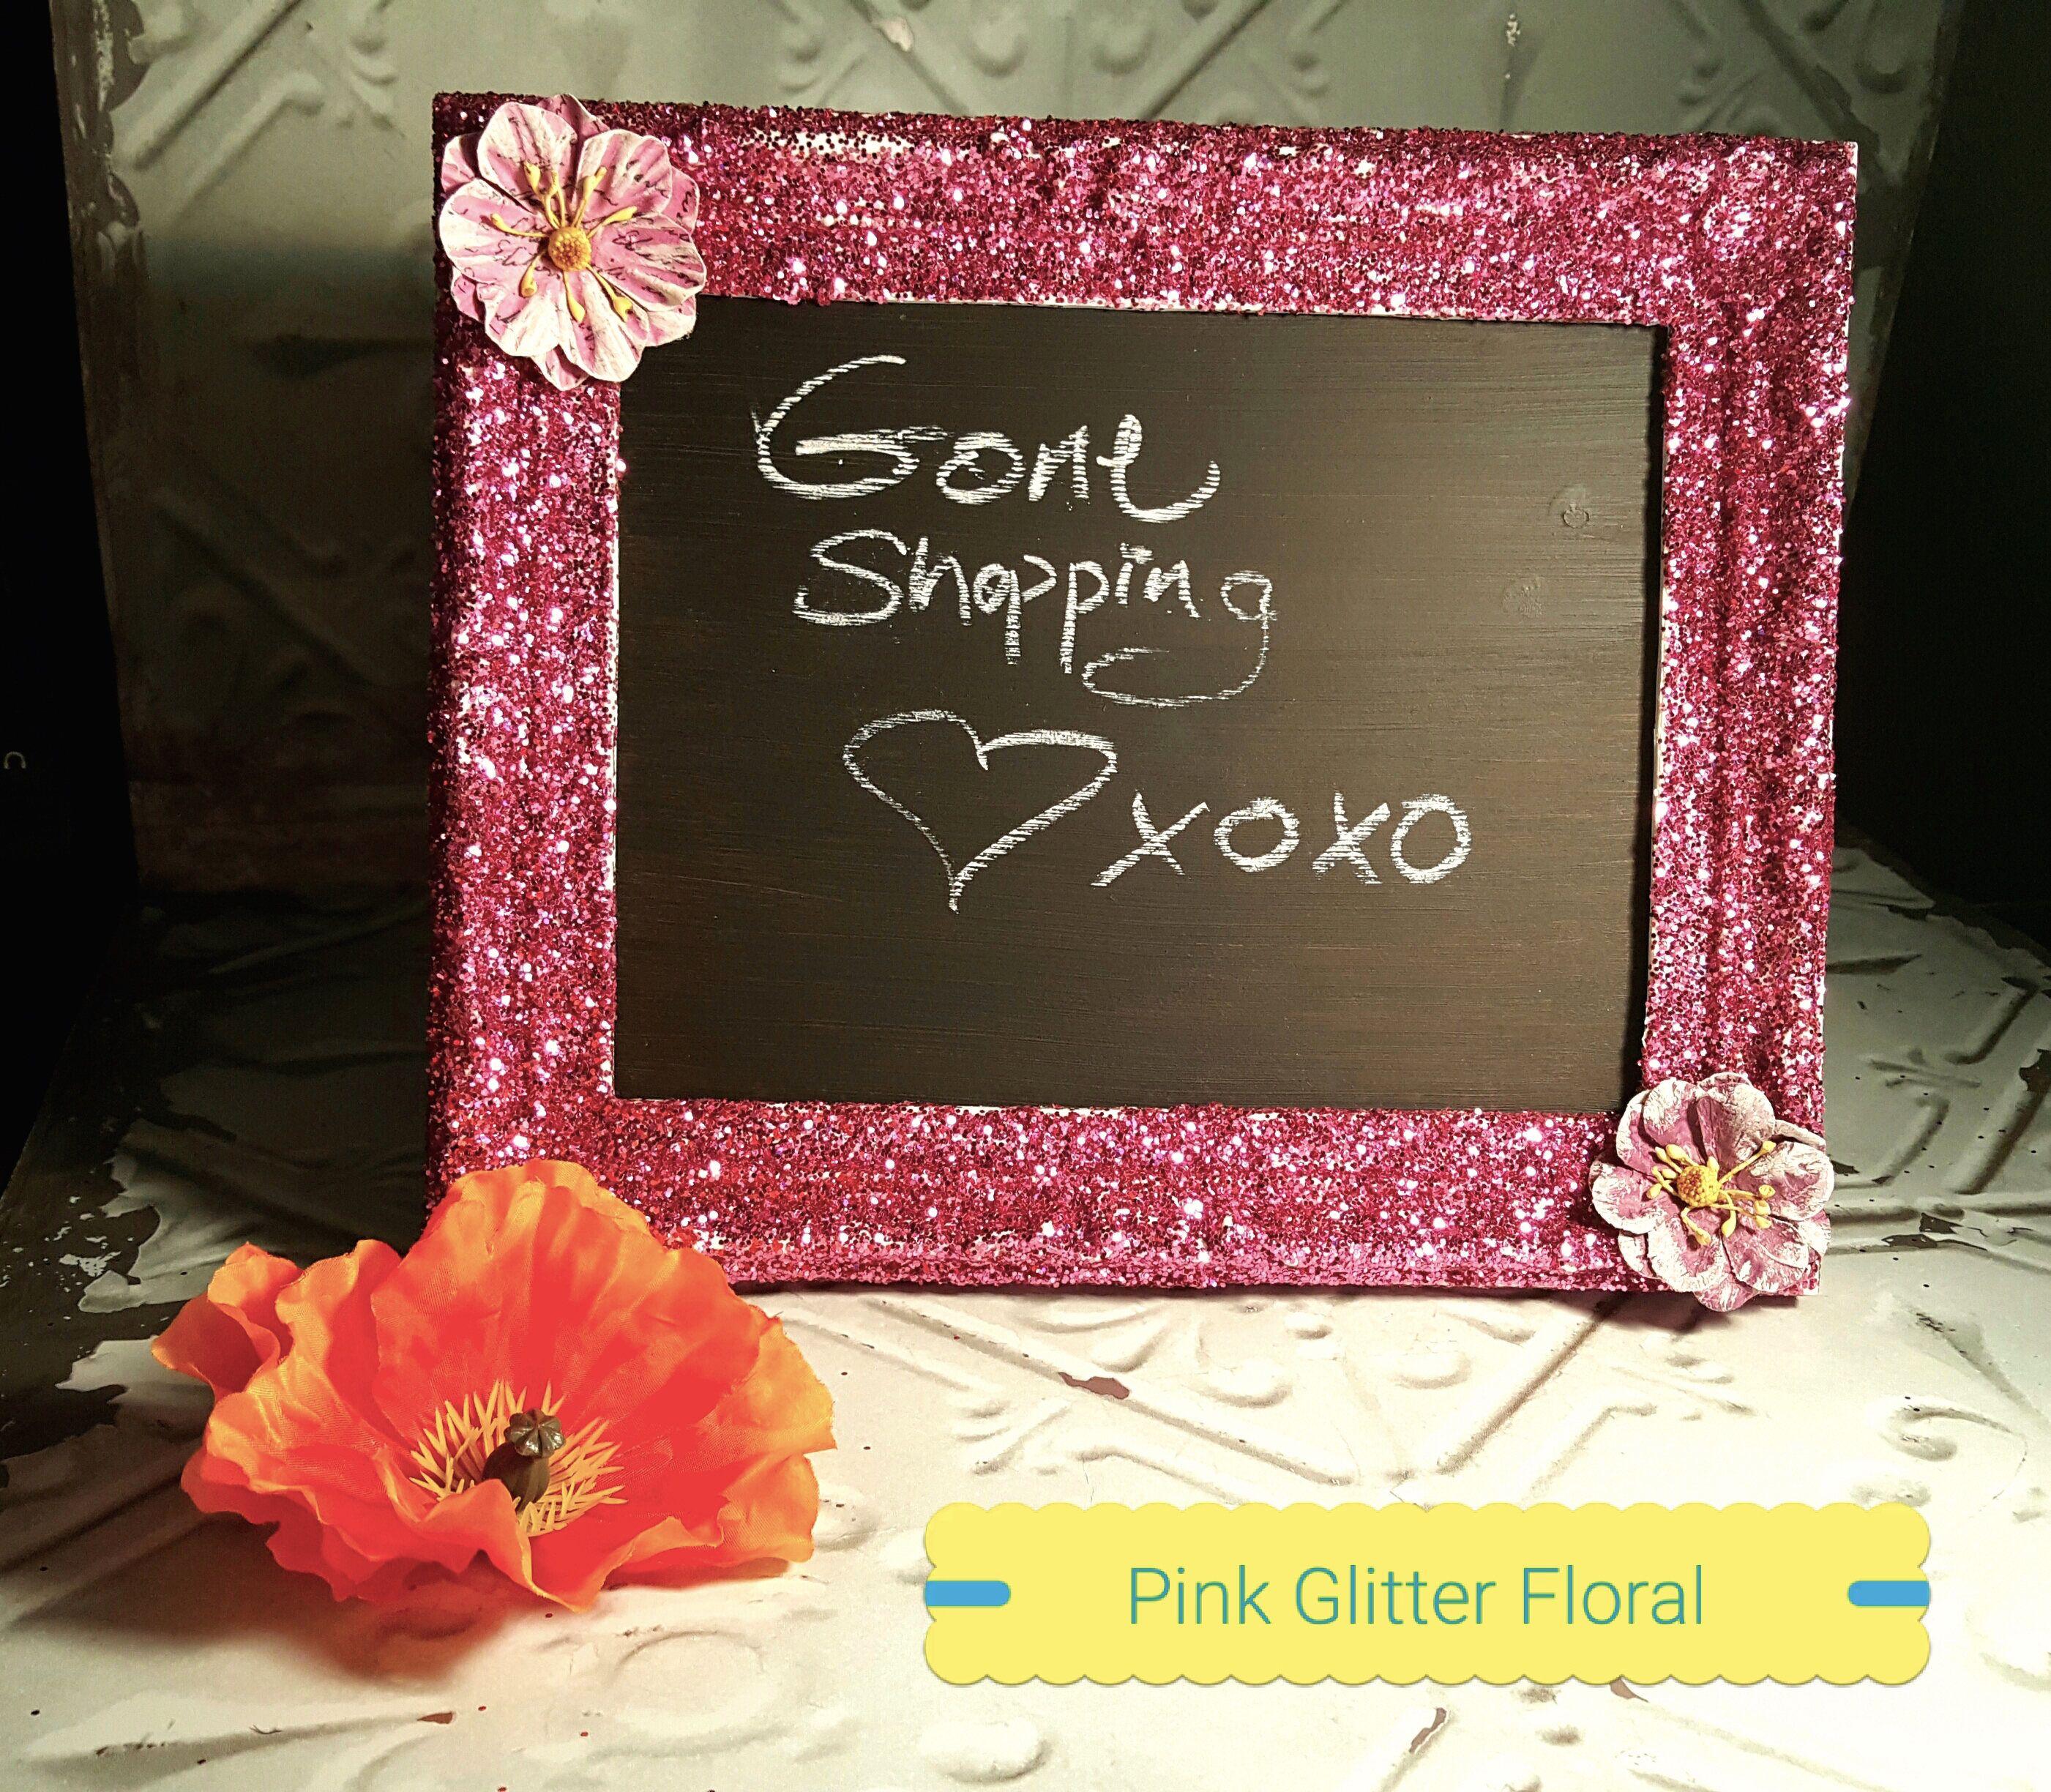 Pink Glitter Floral Framed Chalk Board by Fashion4WardzDesigns on Etsy